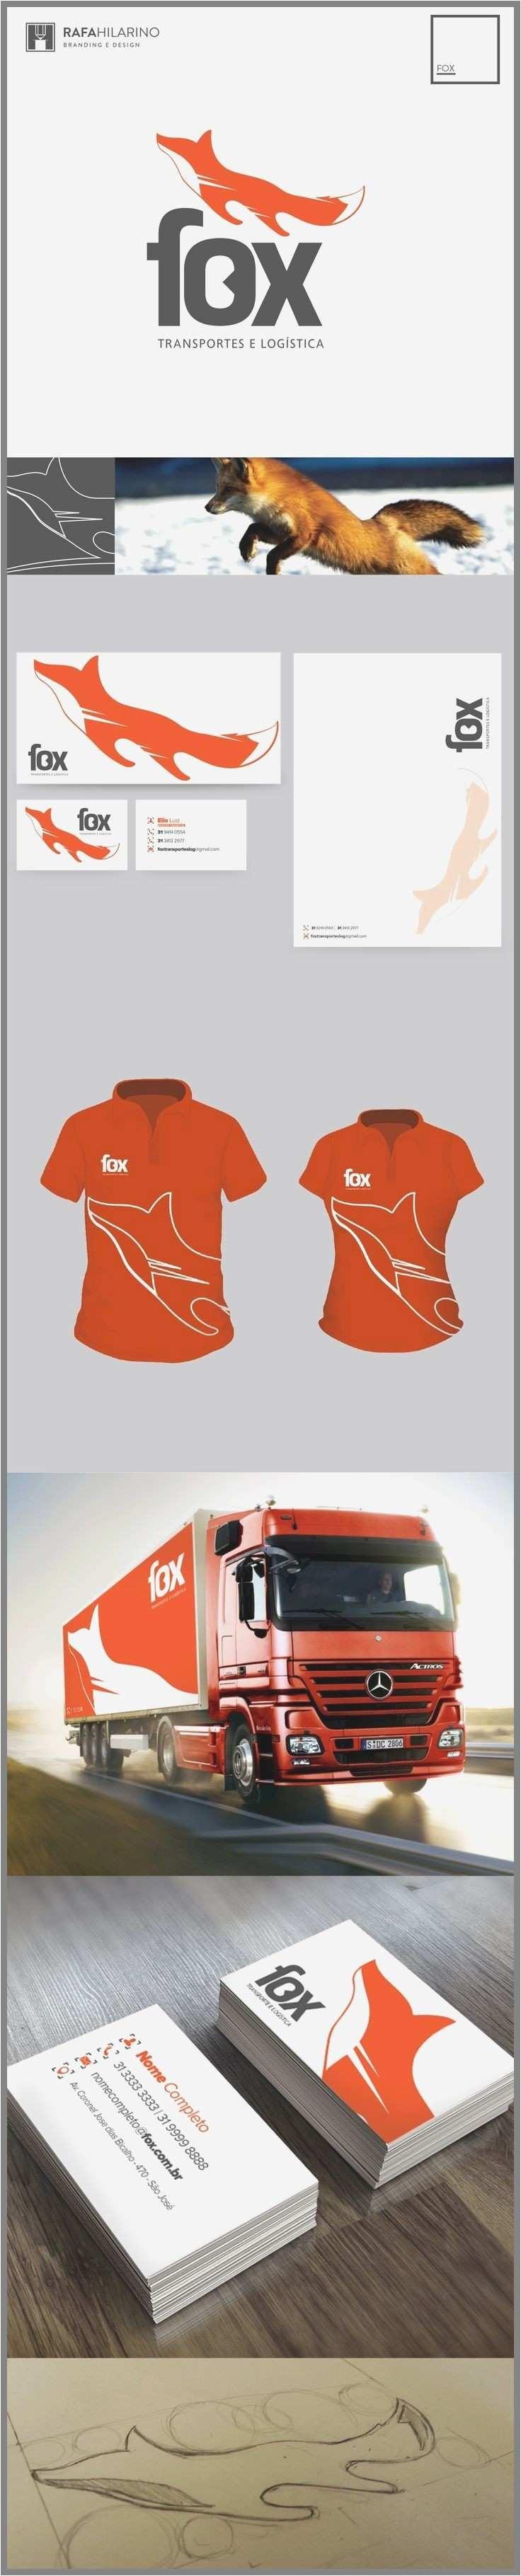 orkin pest control san jose elegant pest control shirts best 32 best termite control